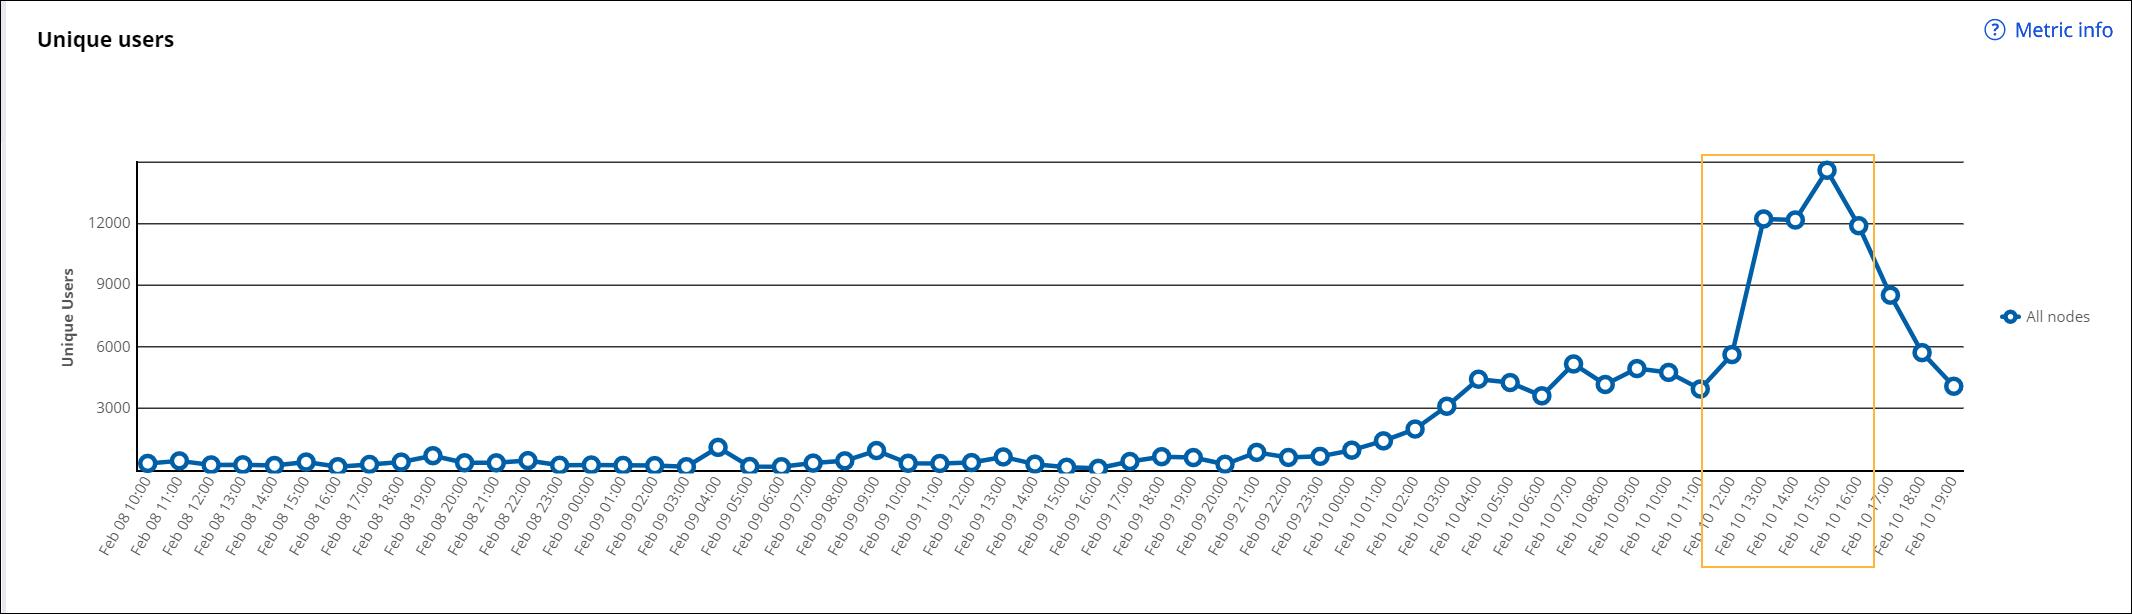 """Unique users chart"""